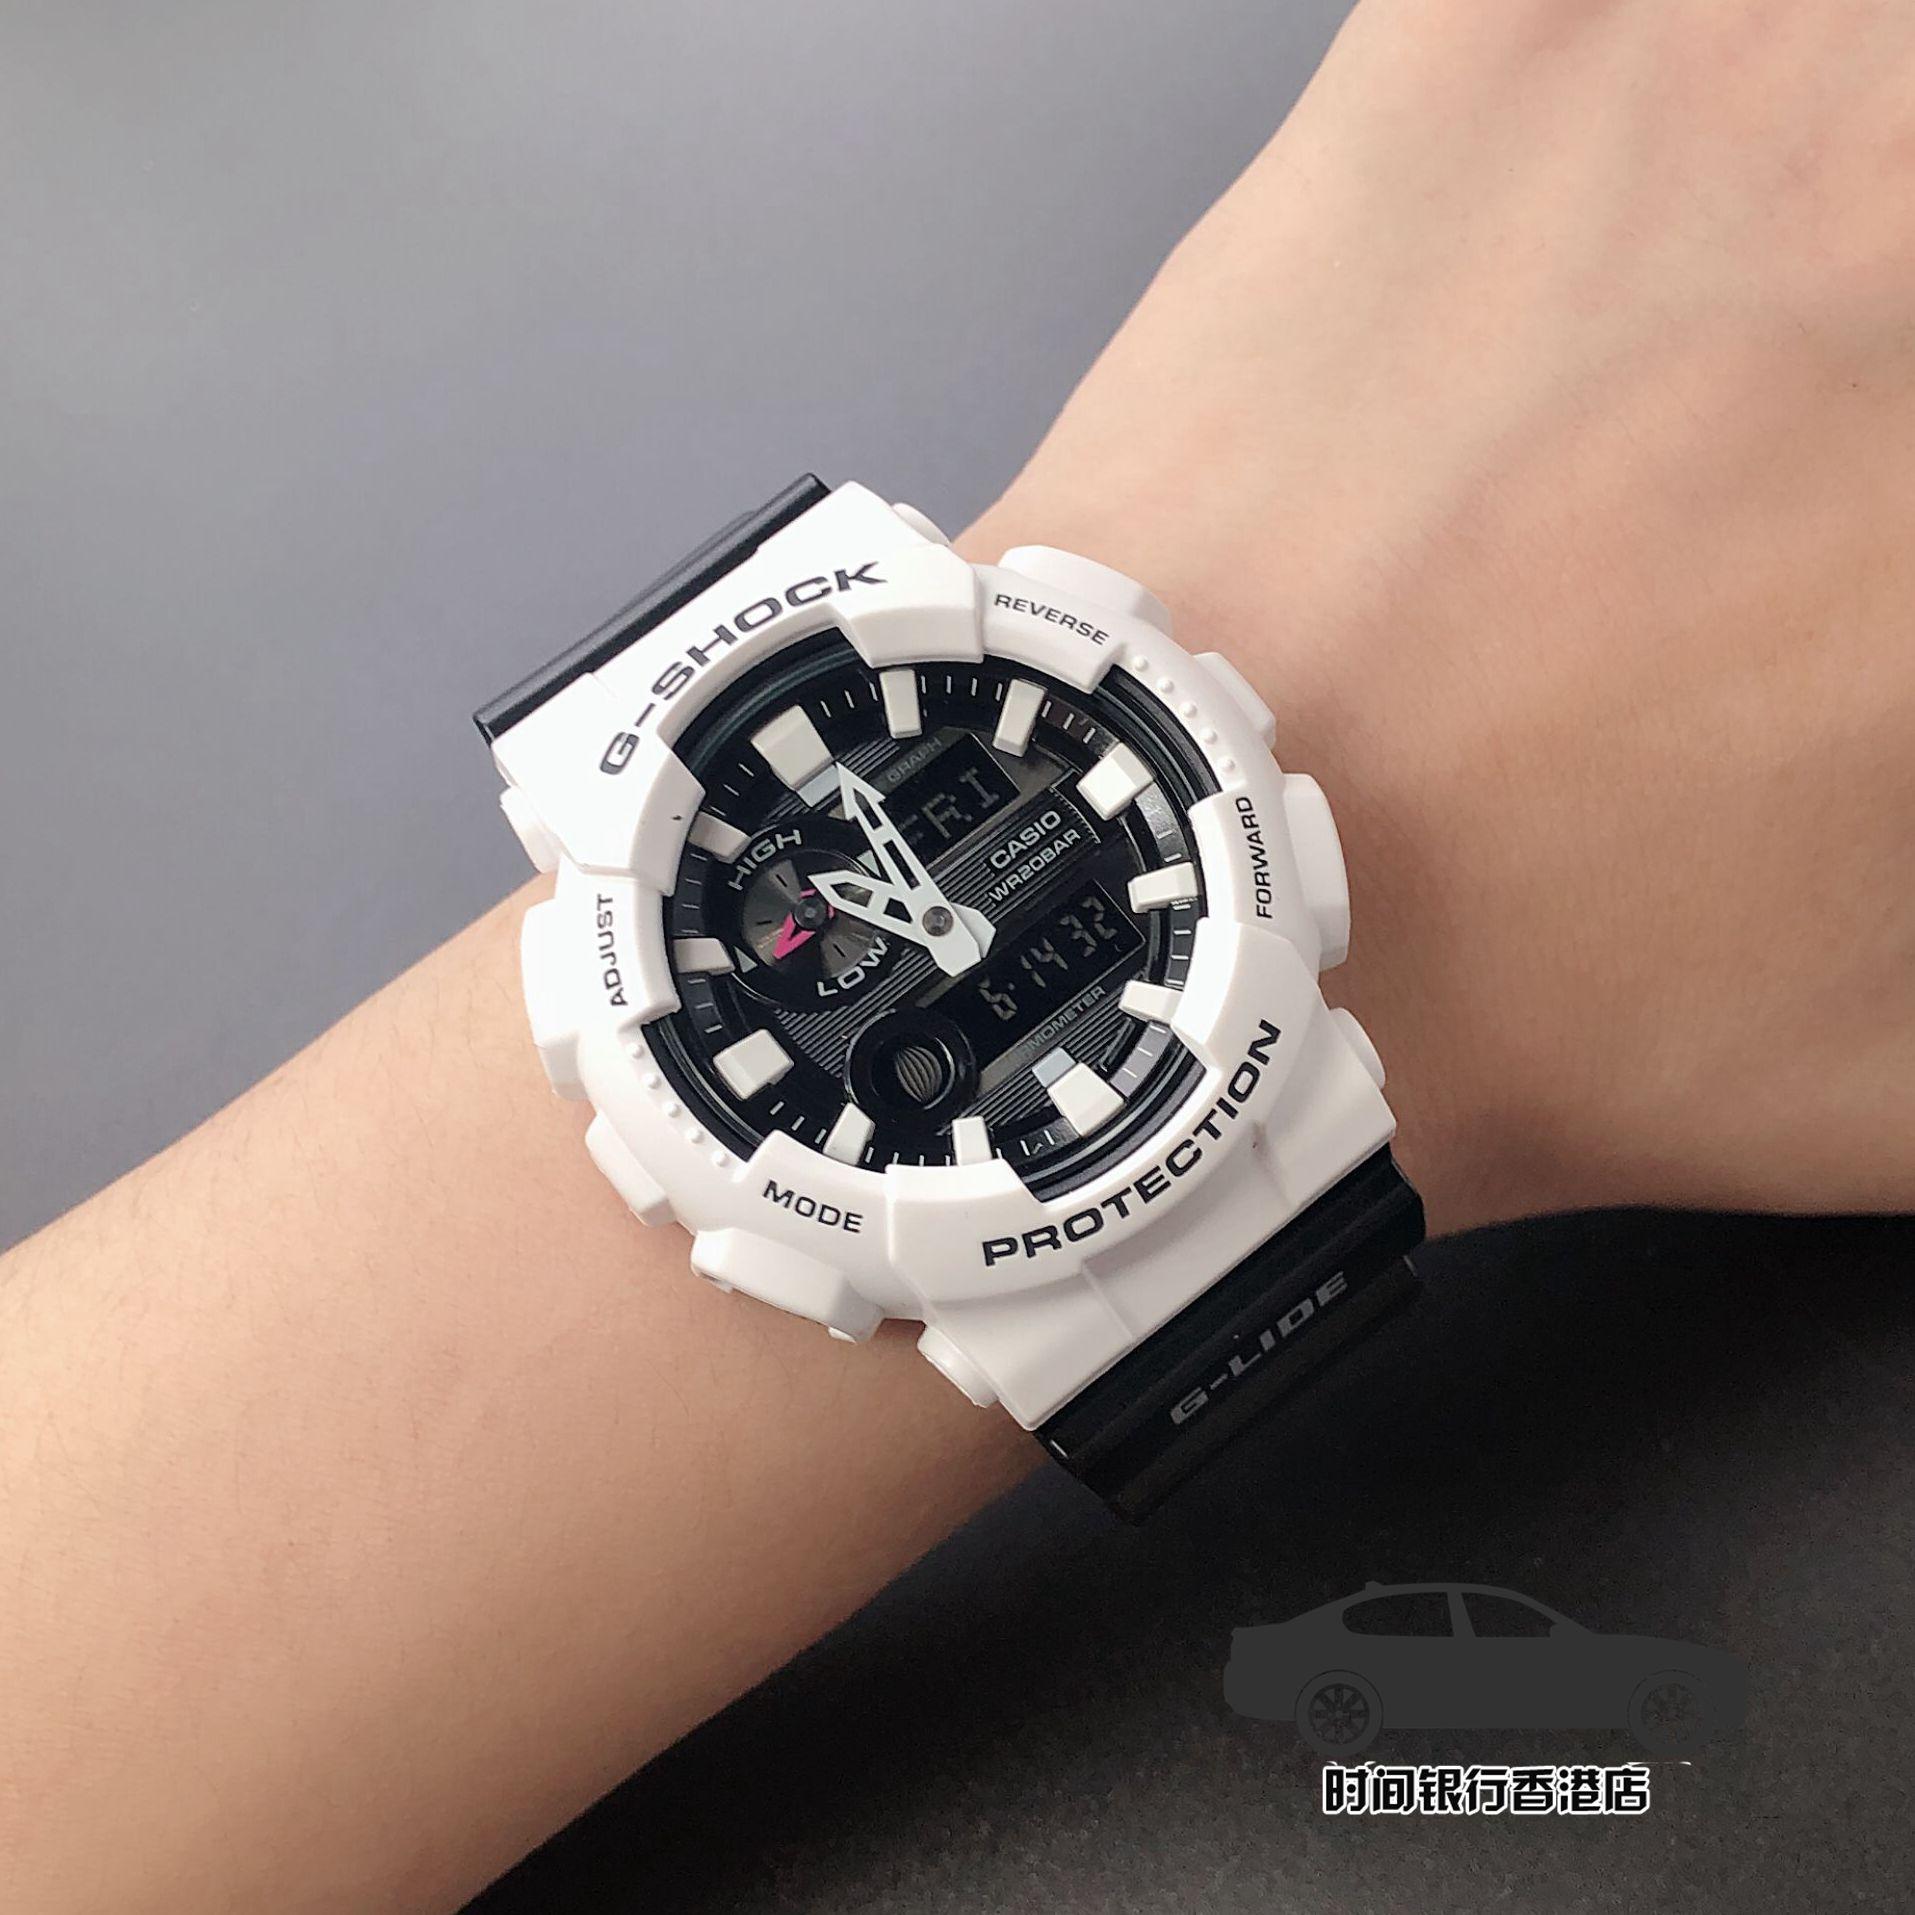 7 MW 7 110GW GA 男防水运动电子表白色奥利奥 SHOCK G 卡西欧手表